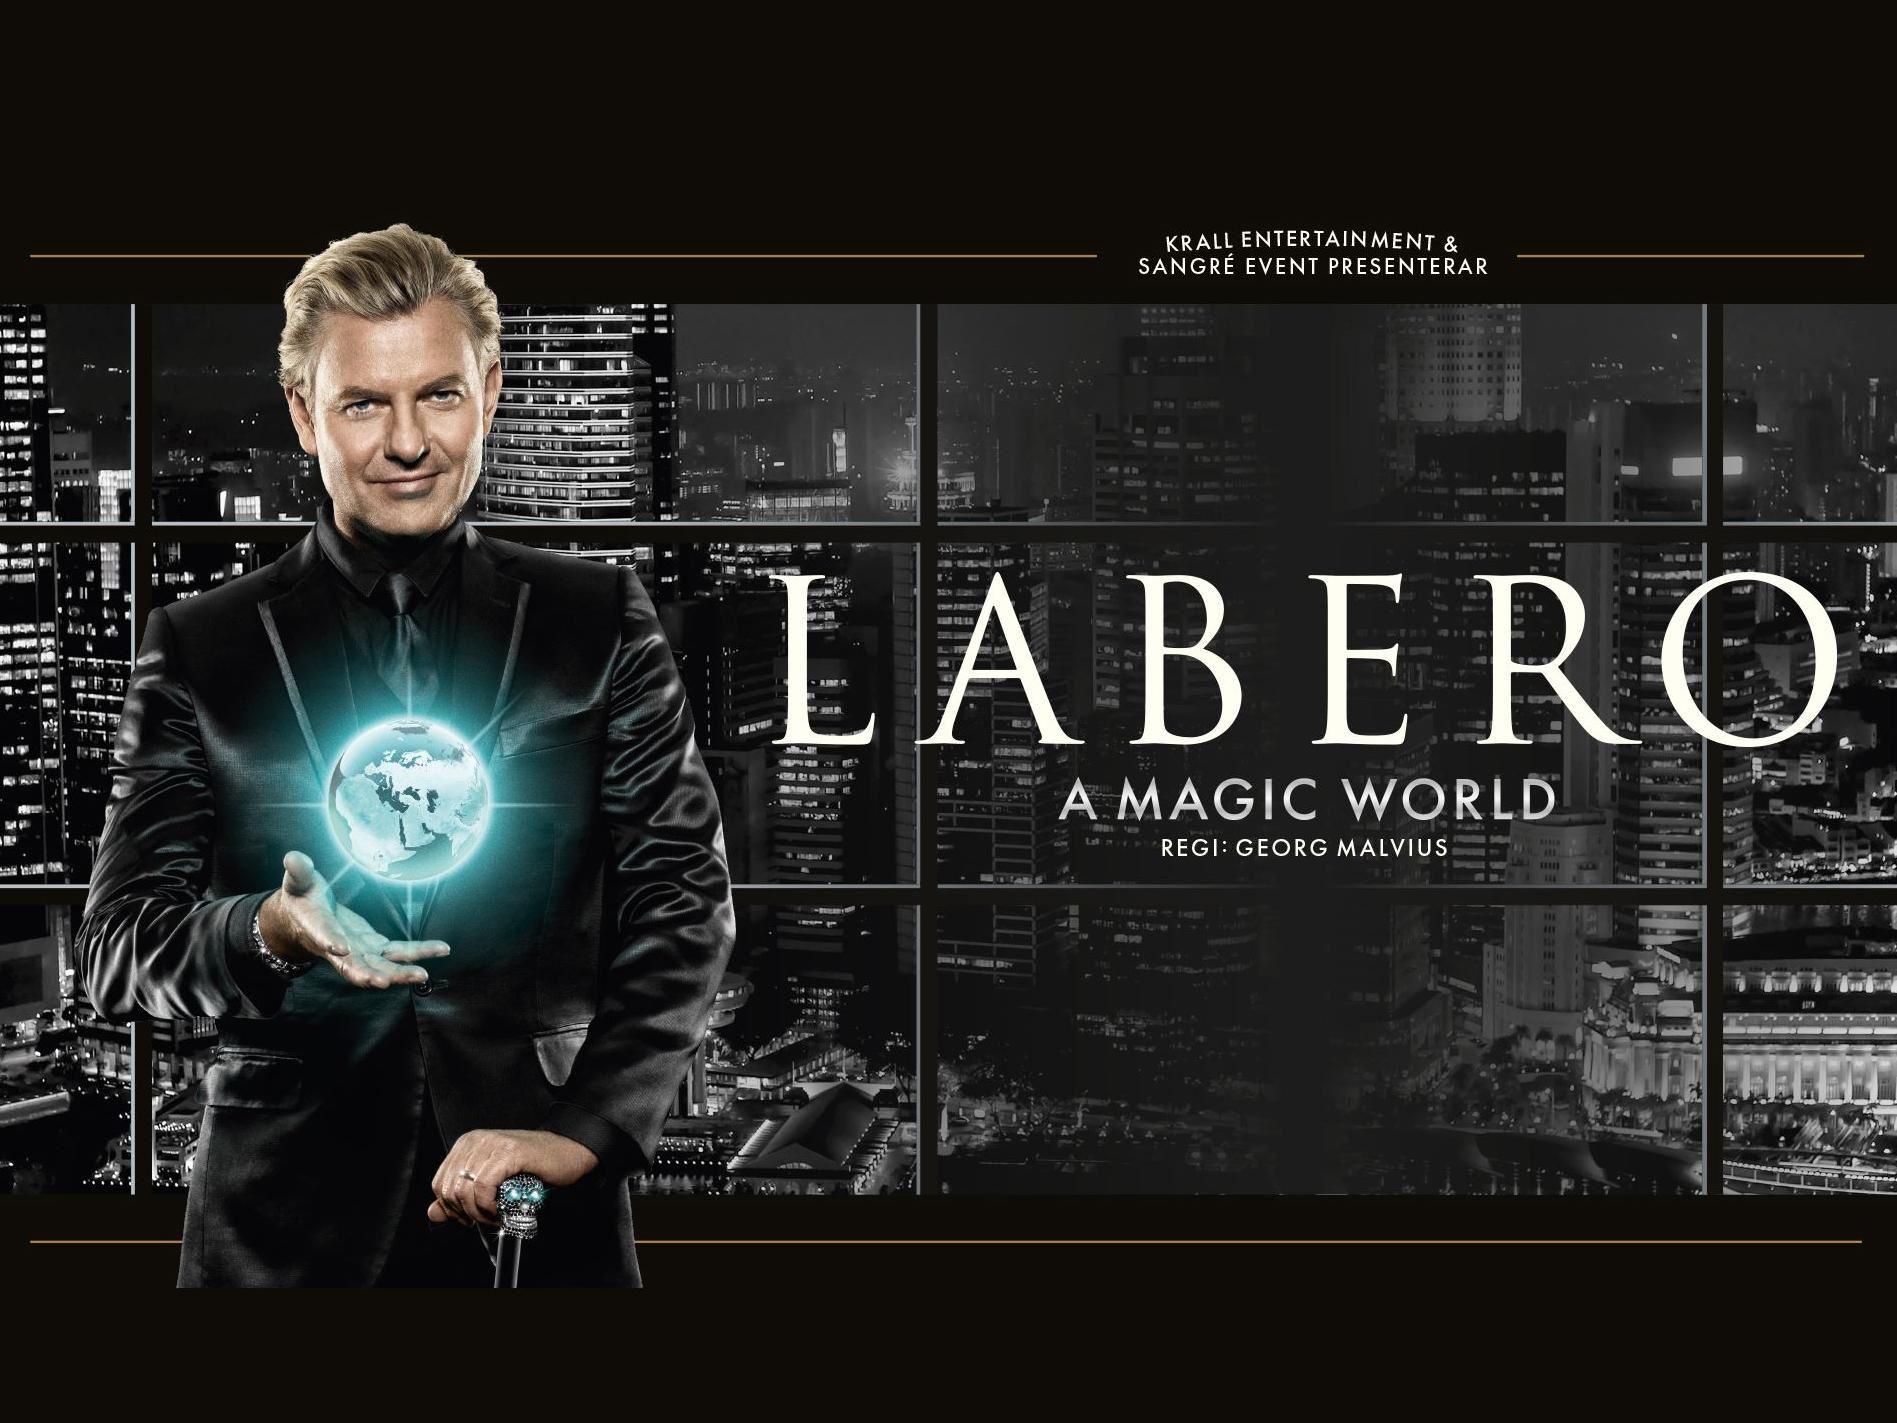 Joe Labero A Magic World